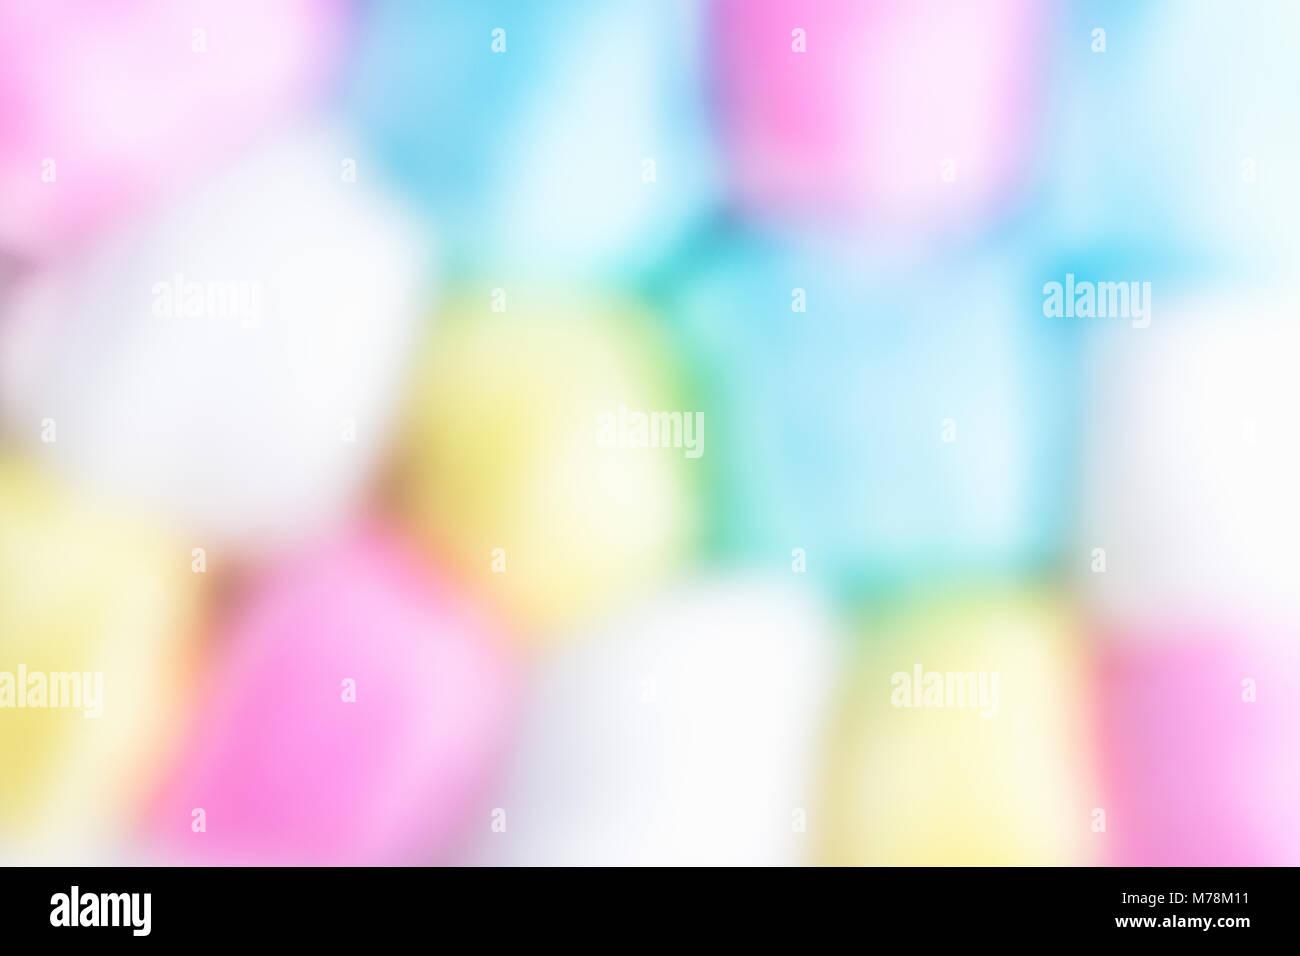 Excelente Algodón De Azúcar Para Colorear Motivo - Dibujos Para ...